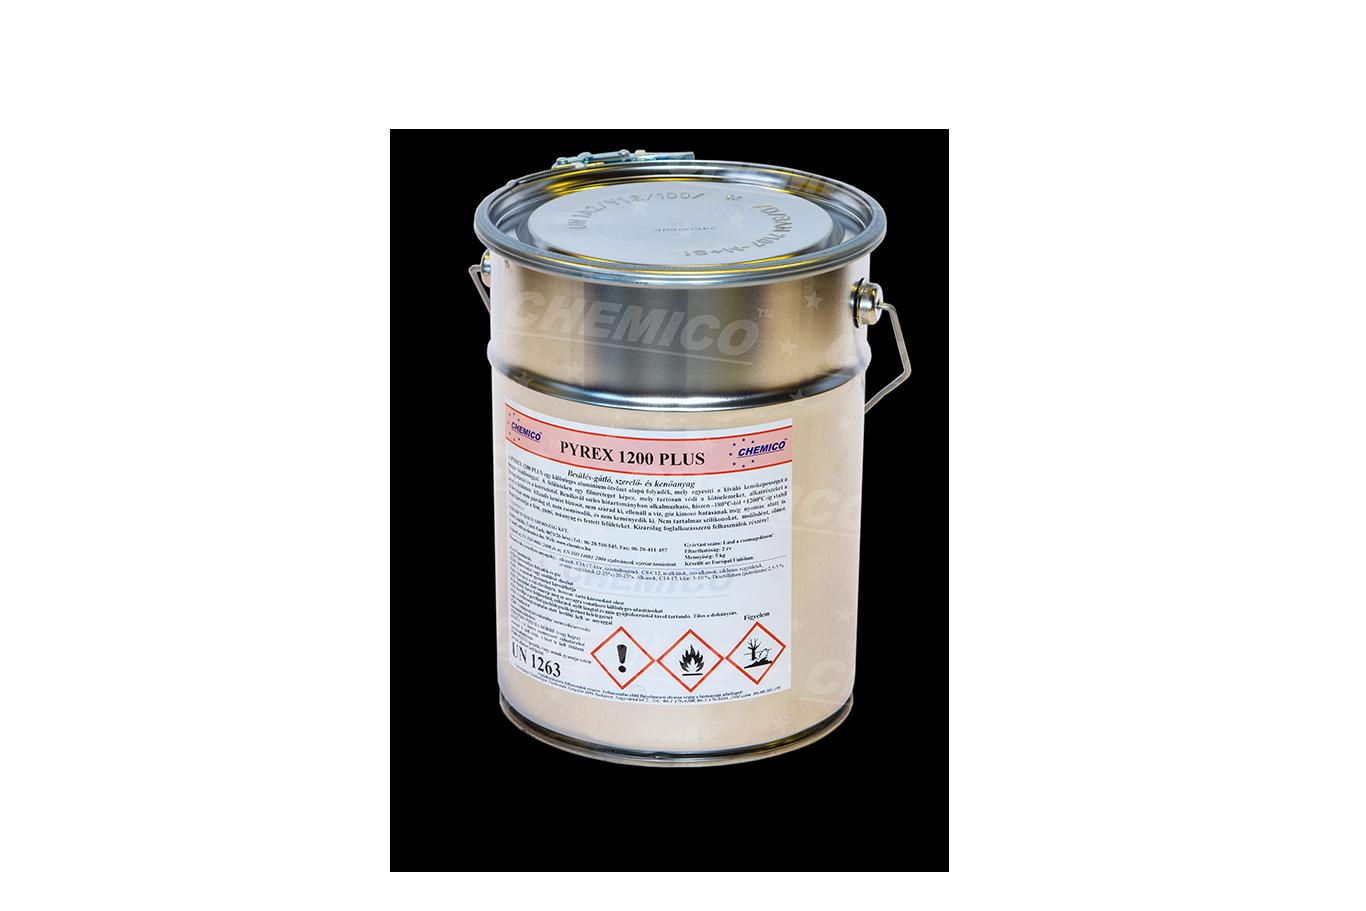 pyrex-1200-plus-besules-gatlo-szerelo-keno-anyag-ipari-chemico-kanna